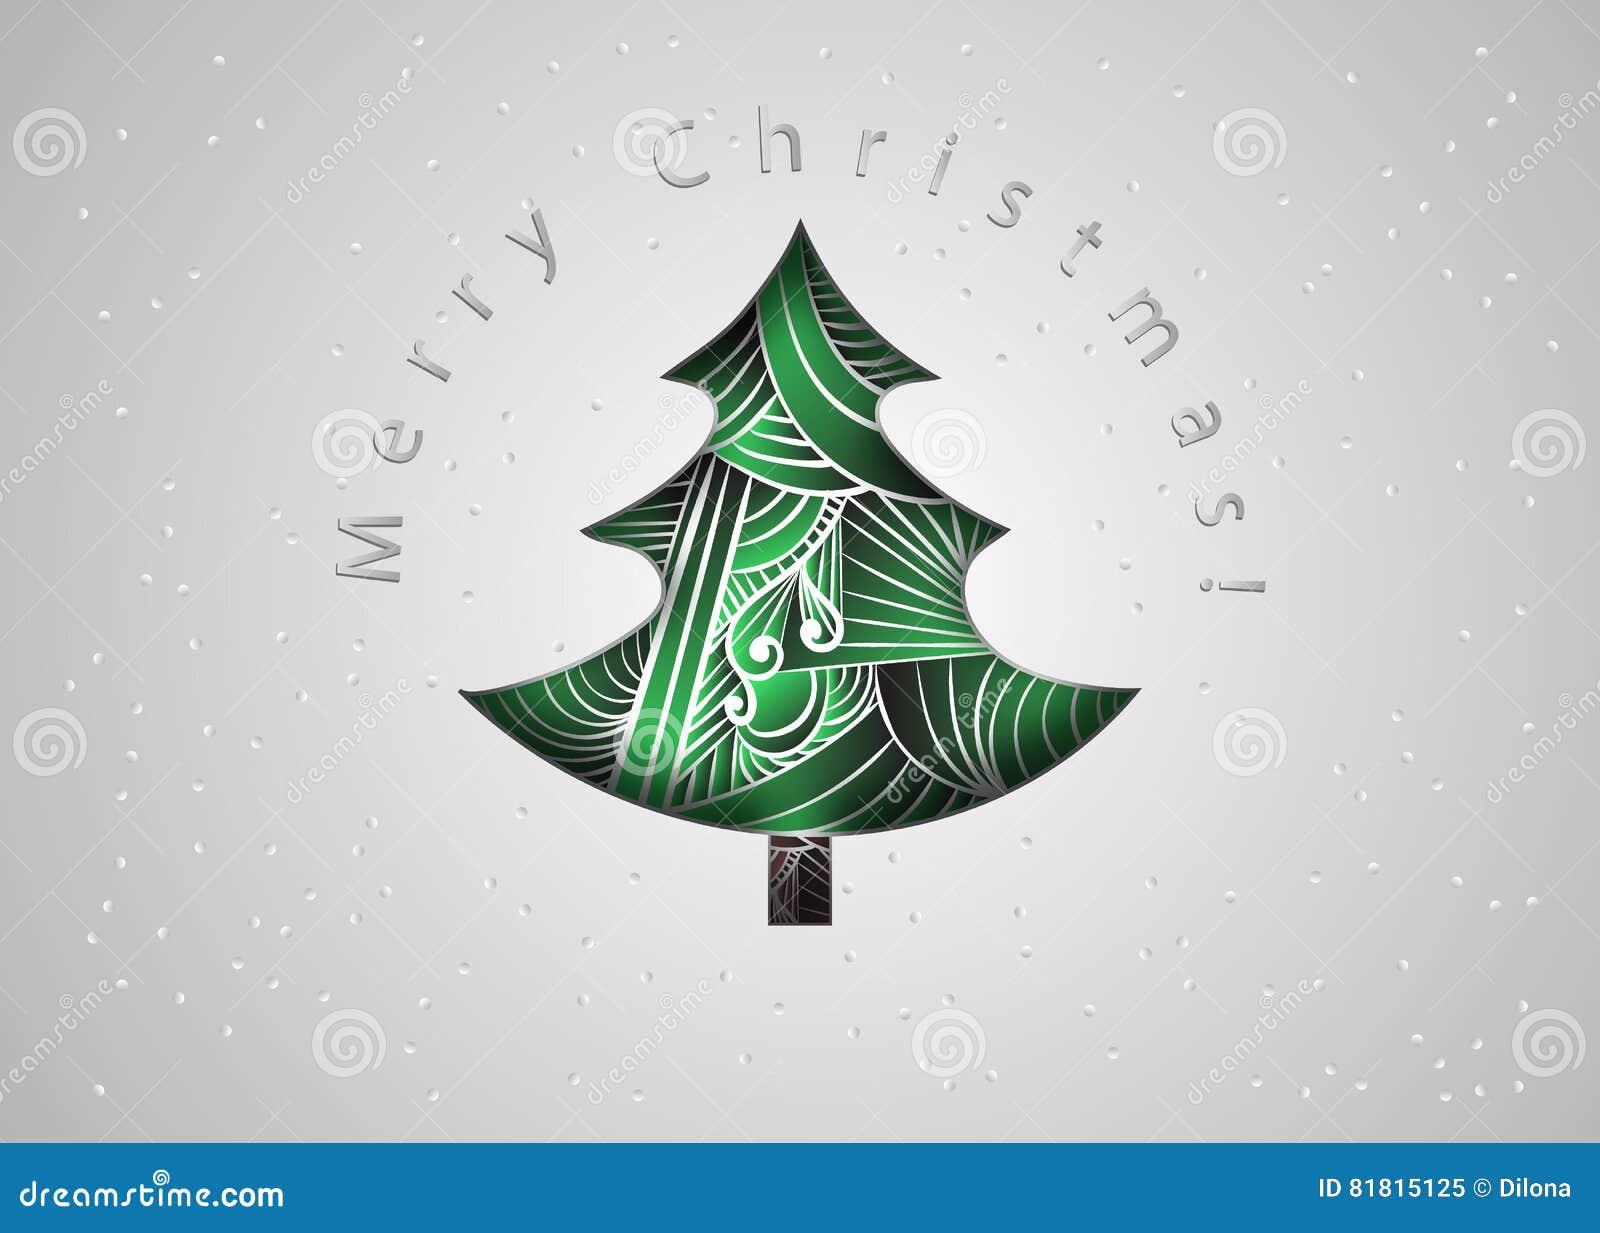 Ma Carte De Noel.Noël Ma Version De Vecteur D Arbre De Portefeuille Carte De